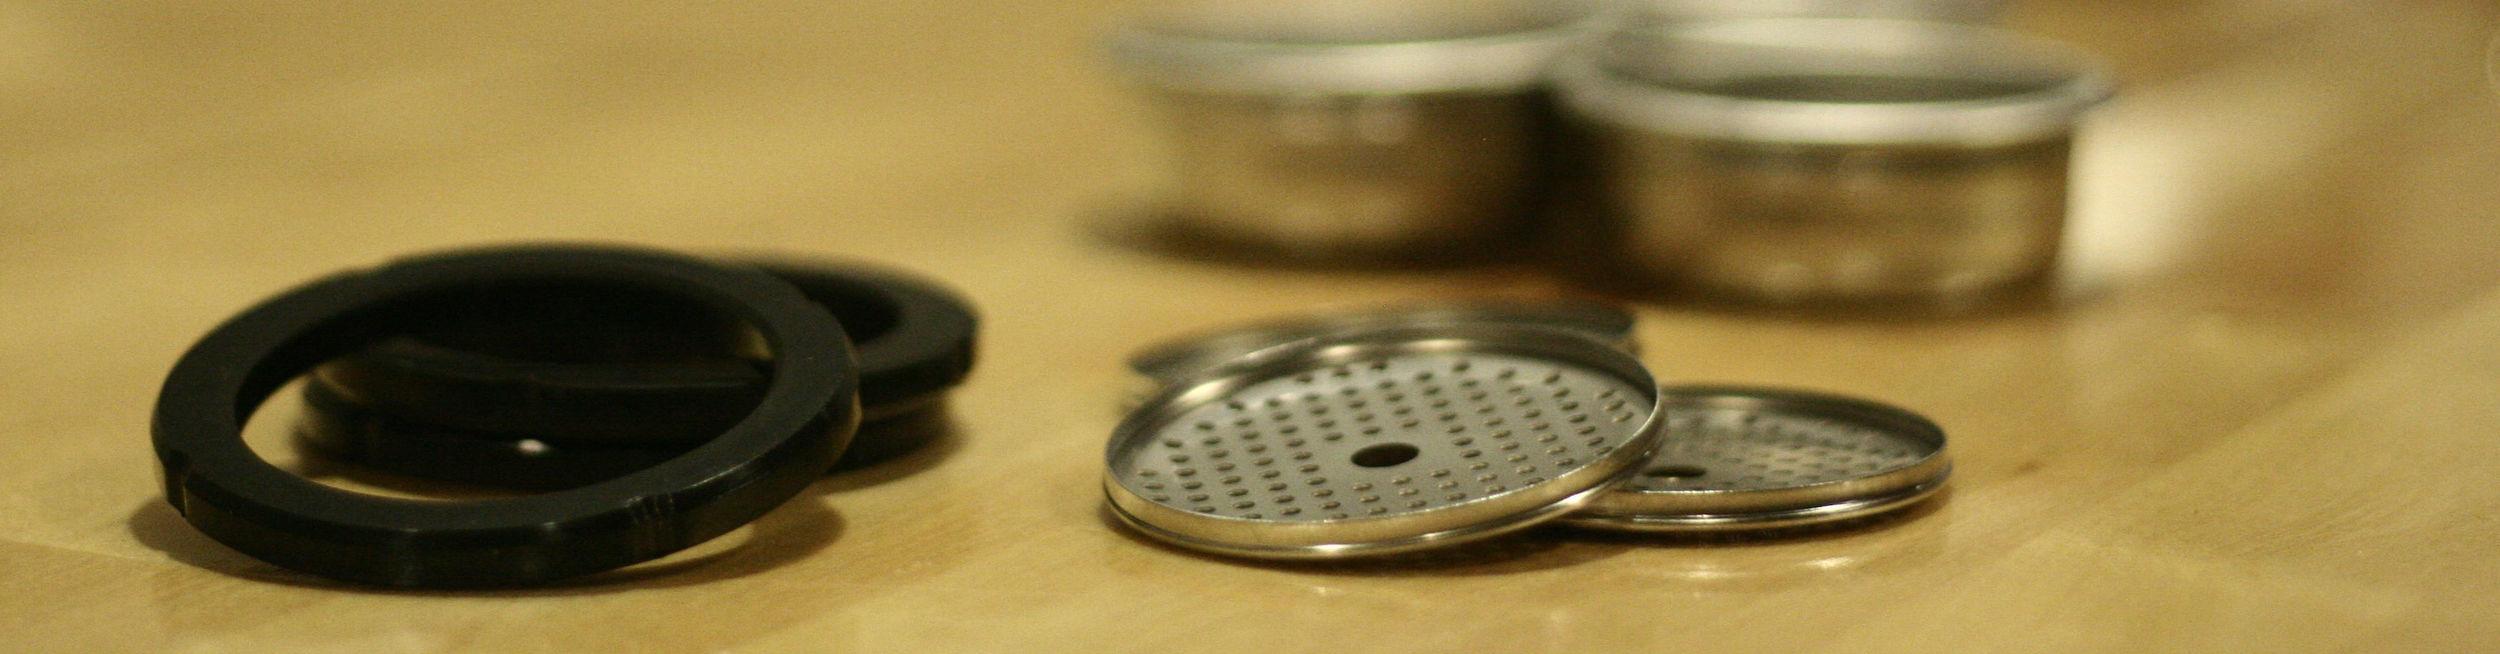 Espresso machine service and repair parts